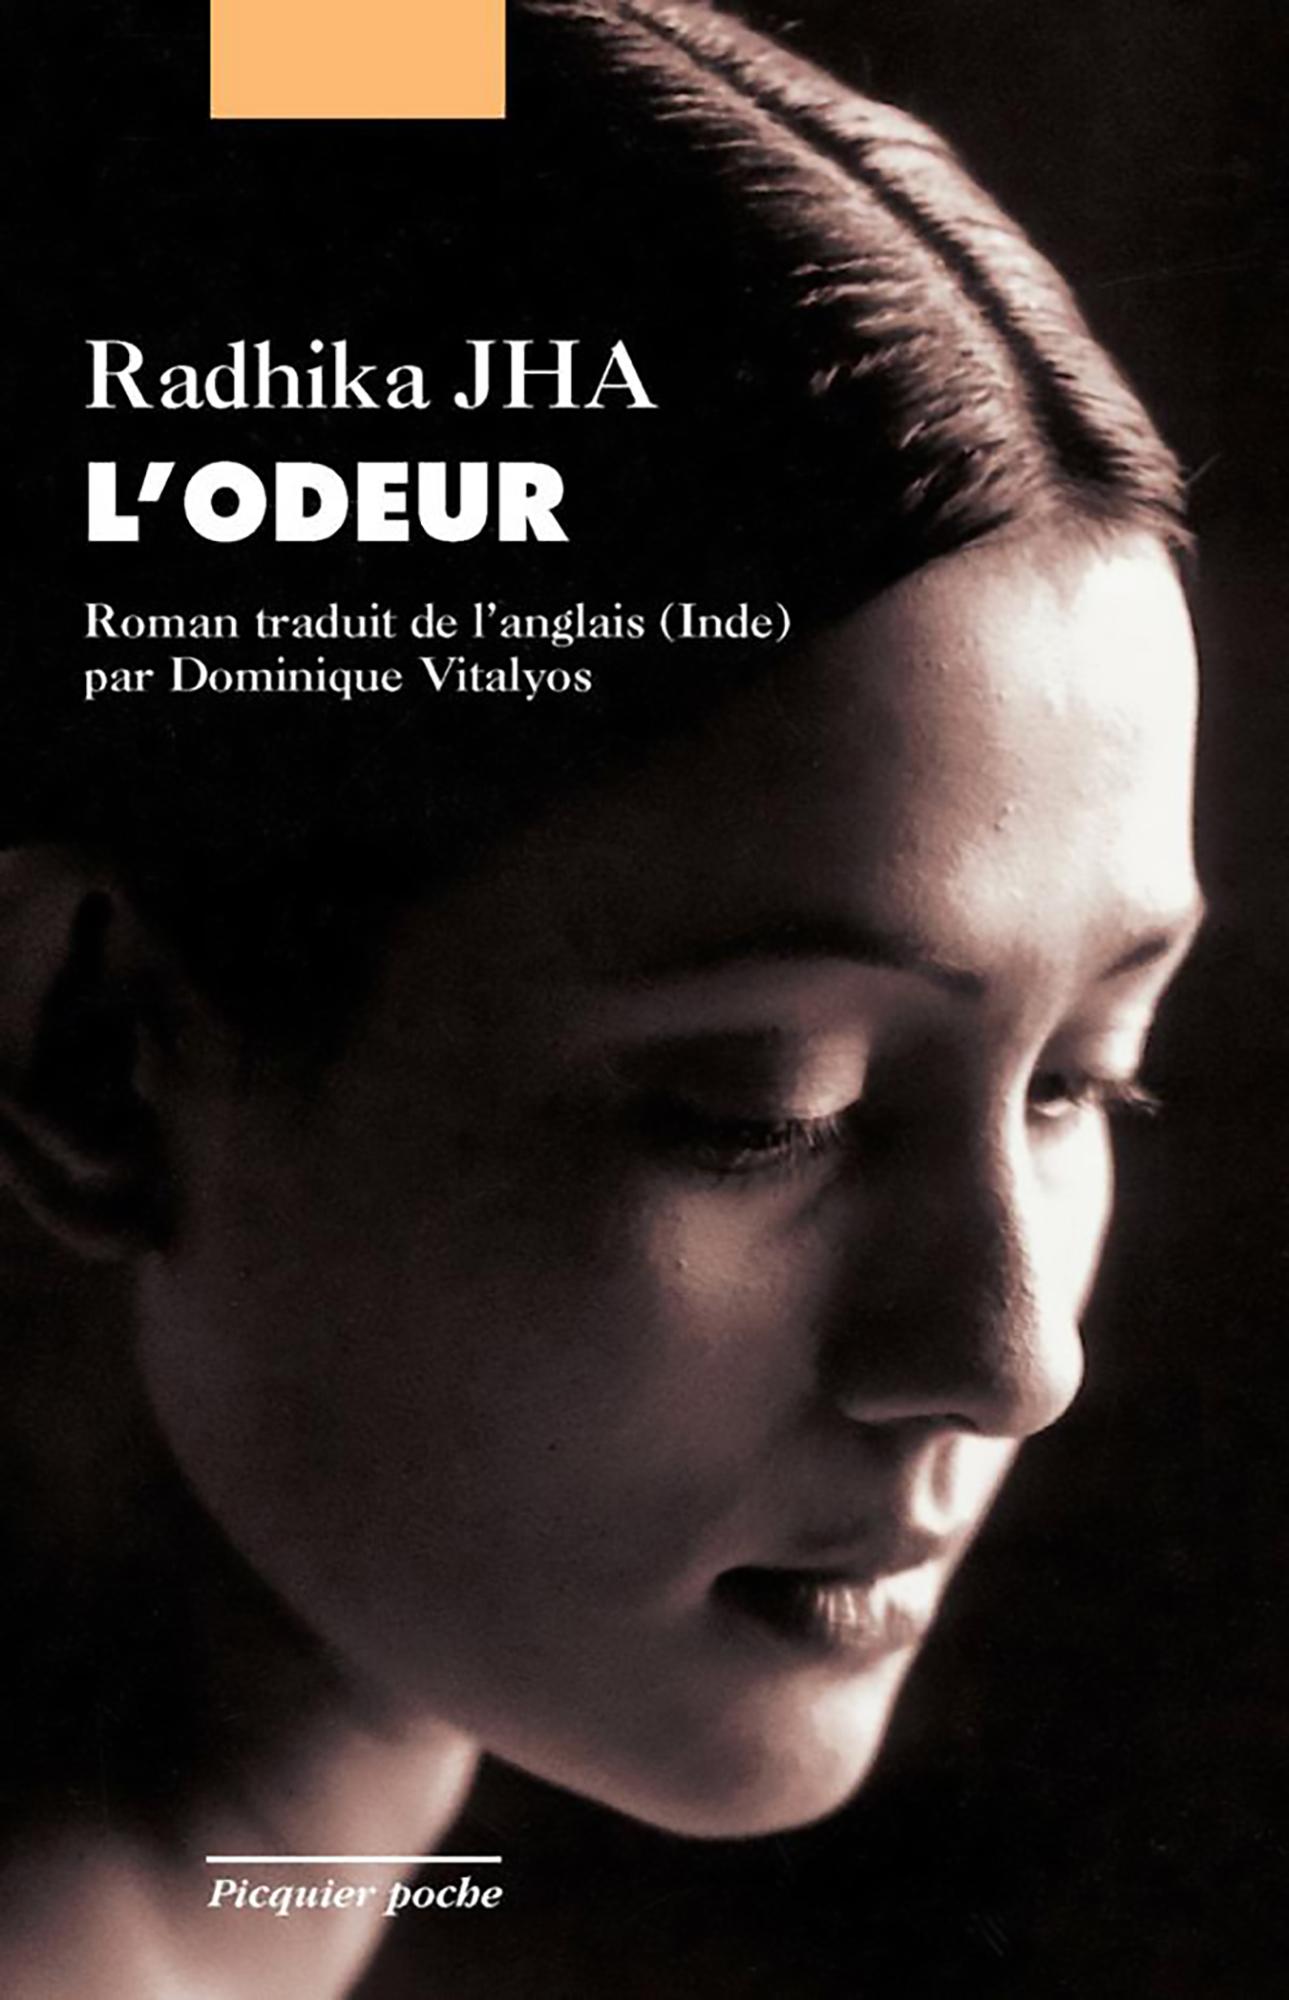 L'Odeur | JHA, Radhika